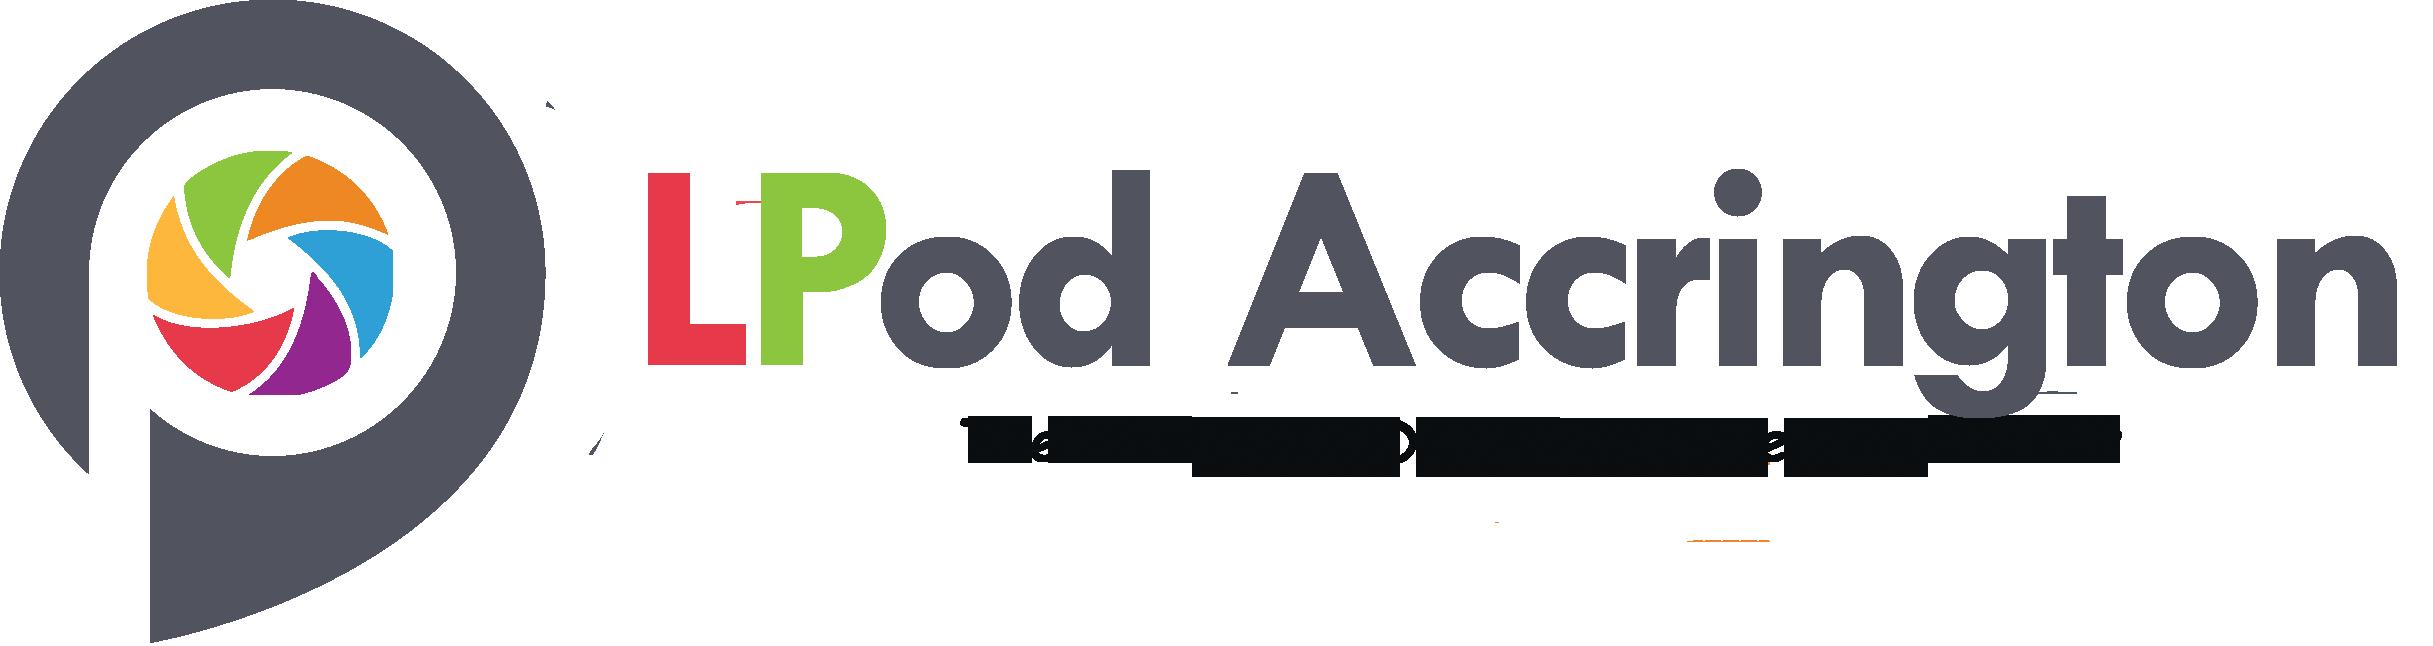 intensive driving courses Accrington